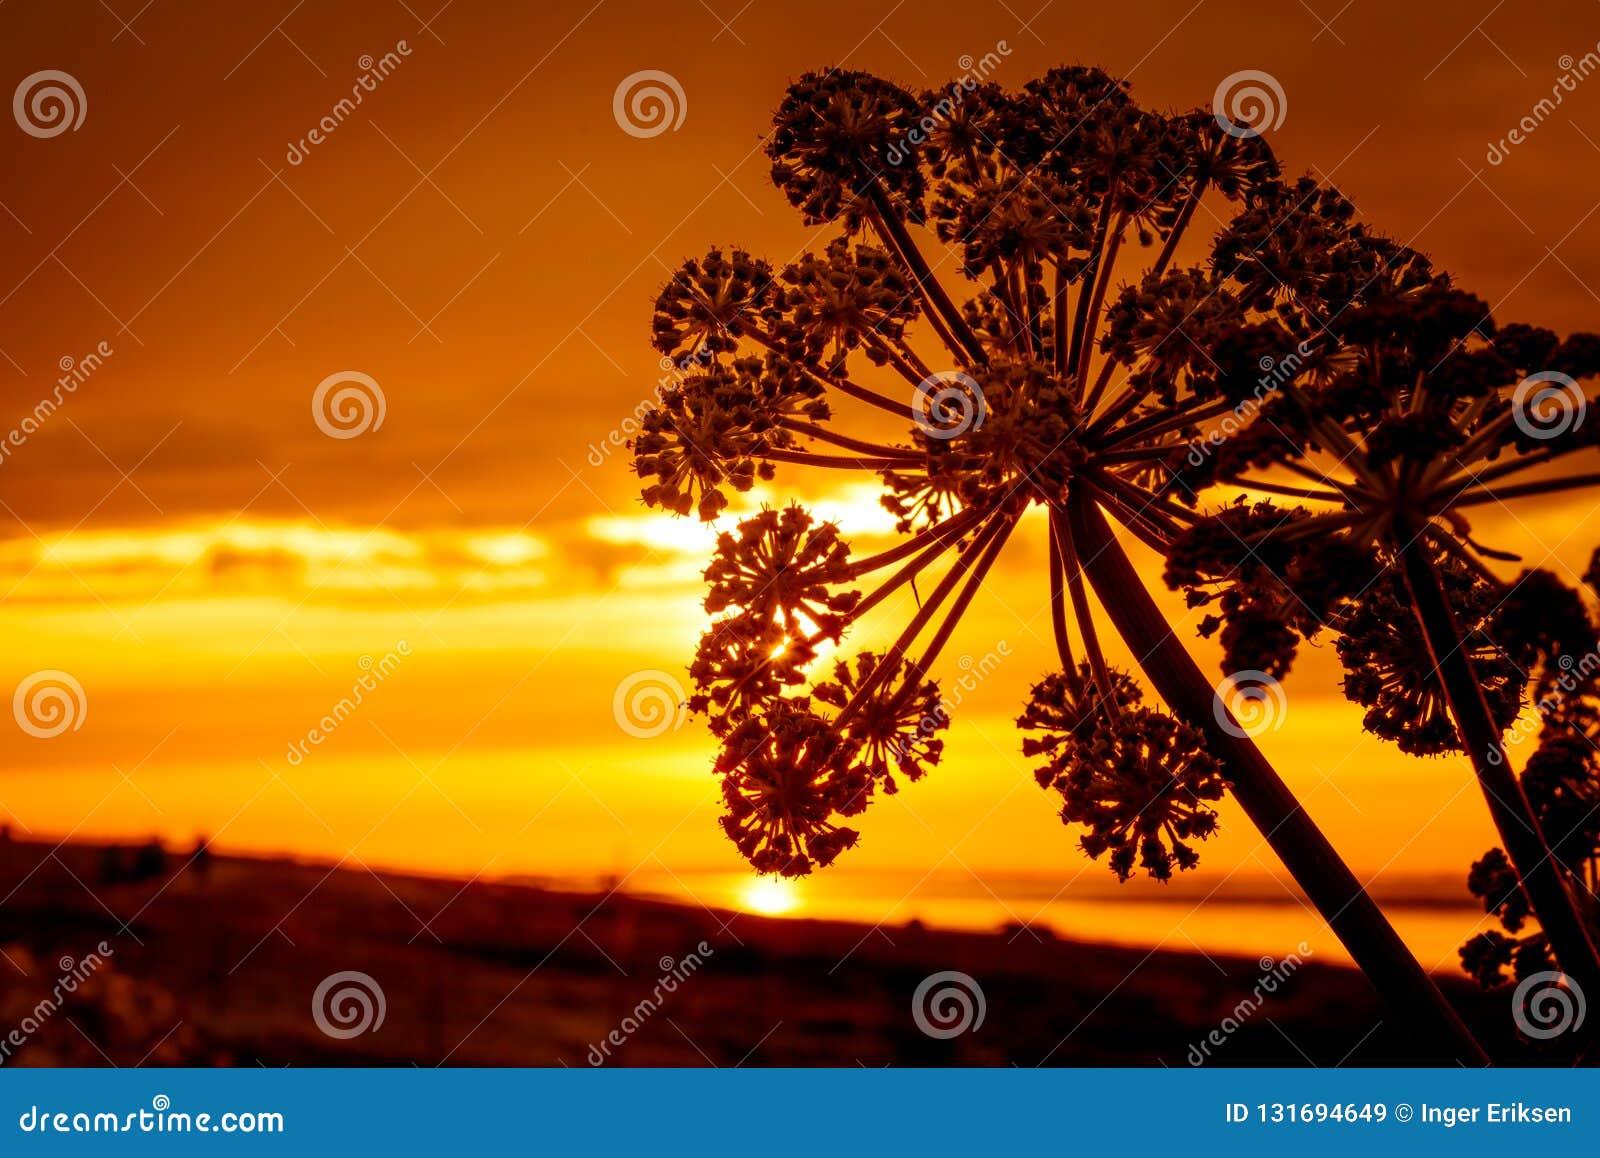 Силуэт цветка в золотом заходе солнца